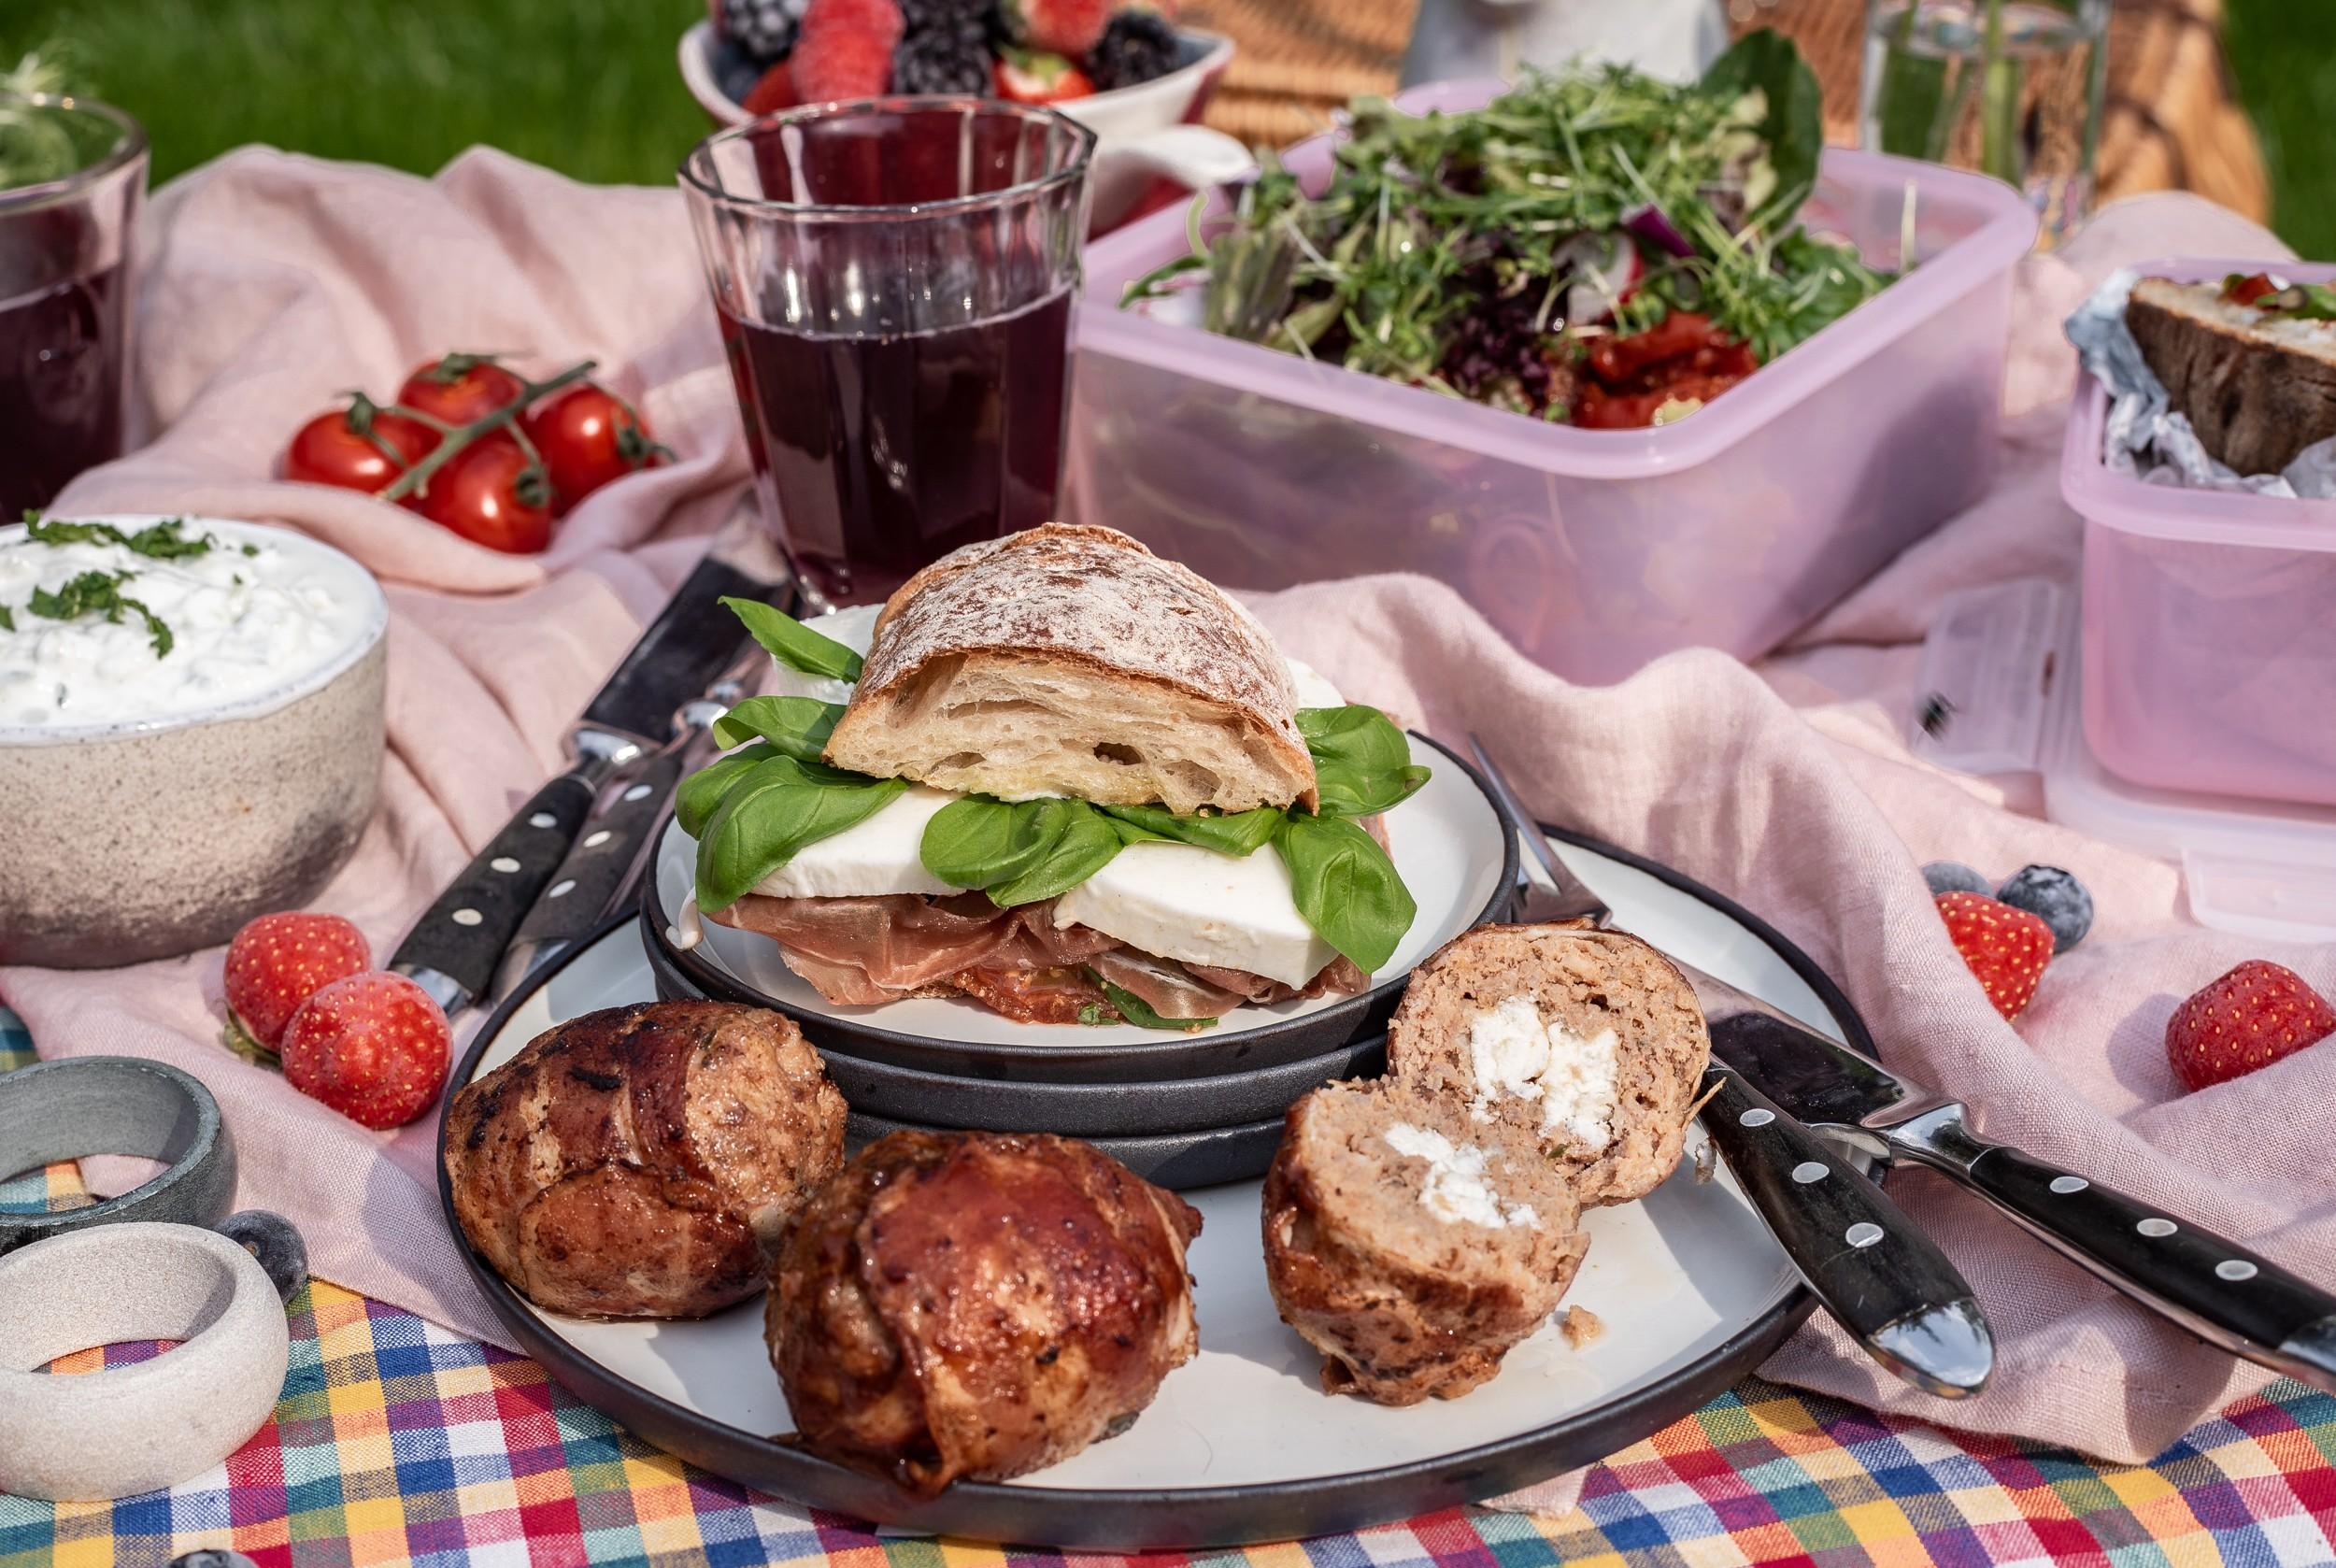 Meatballs und Sandwich Caprese